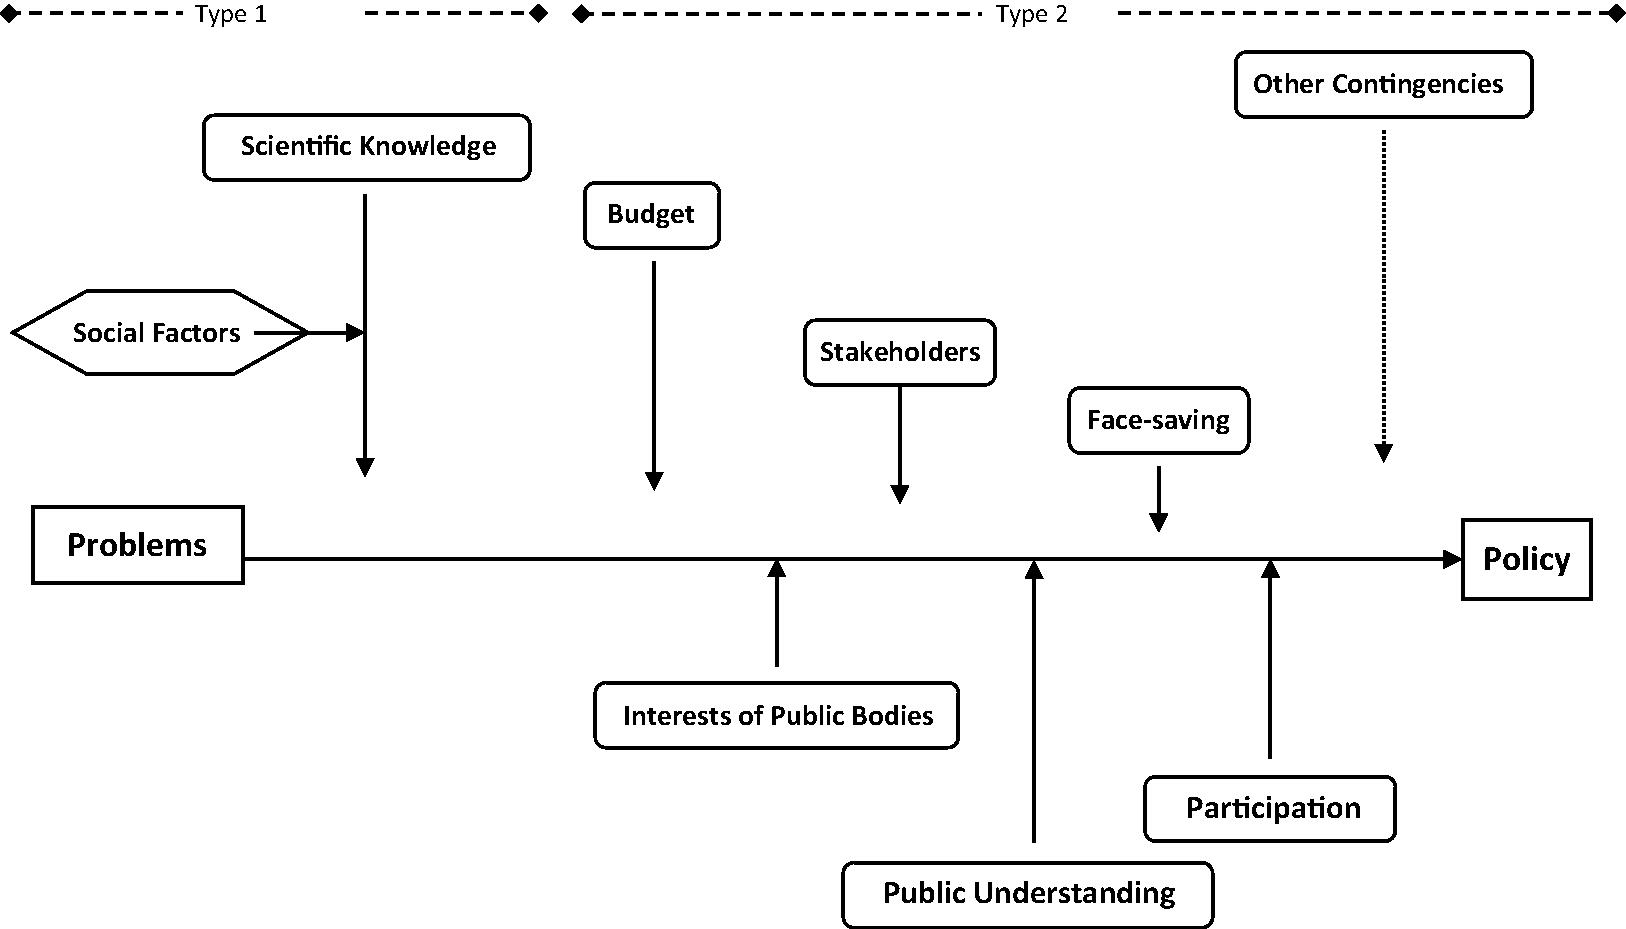 Specialty Areas (Part IV) - The Cambridge Handbook of Sociology